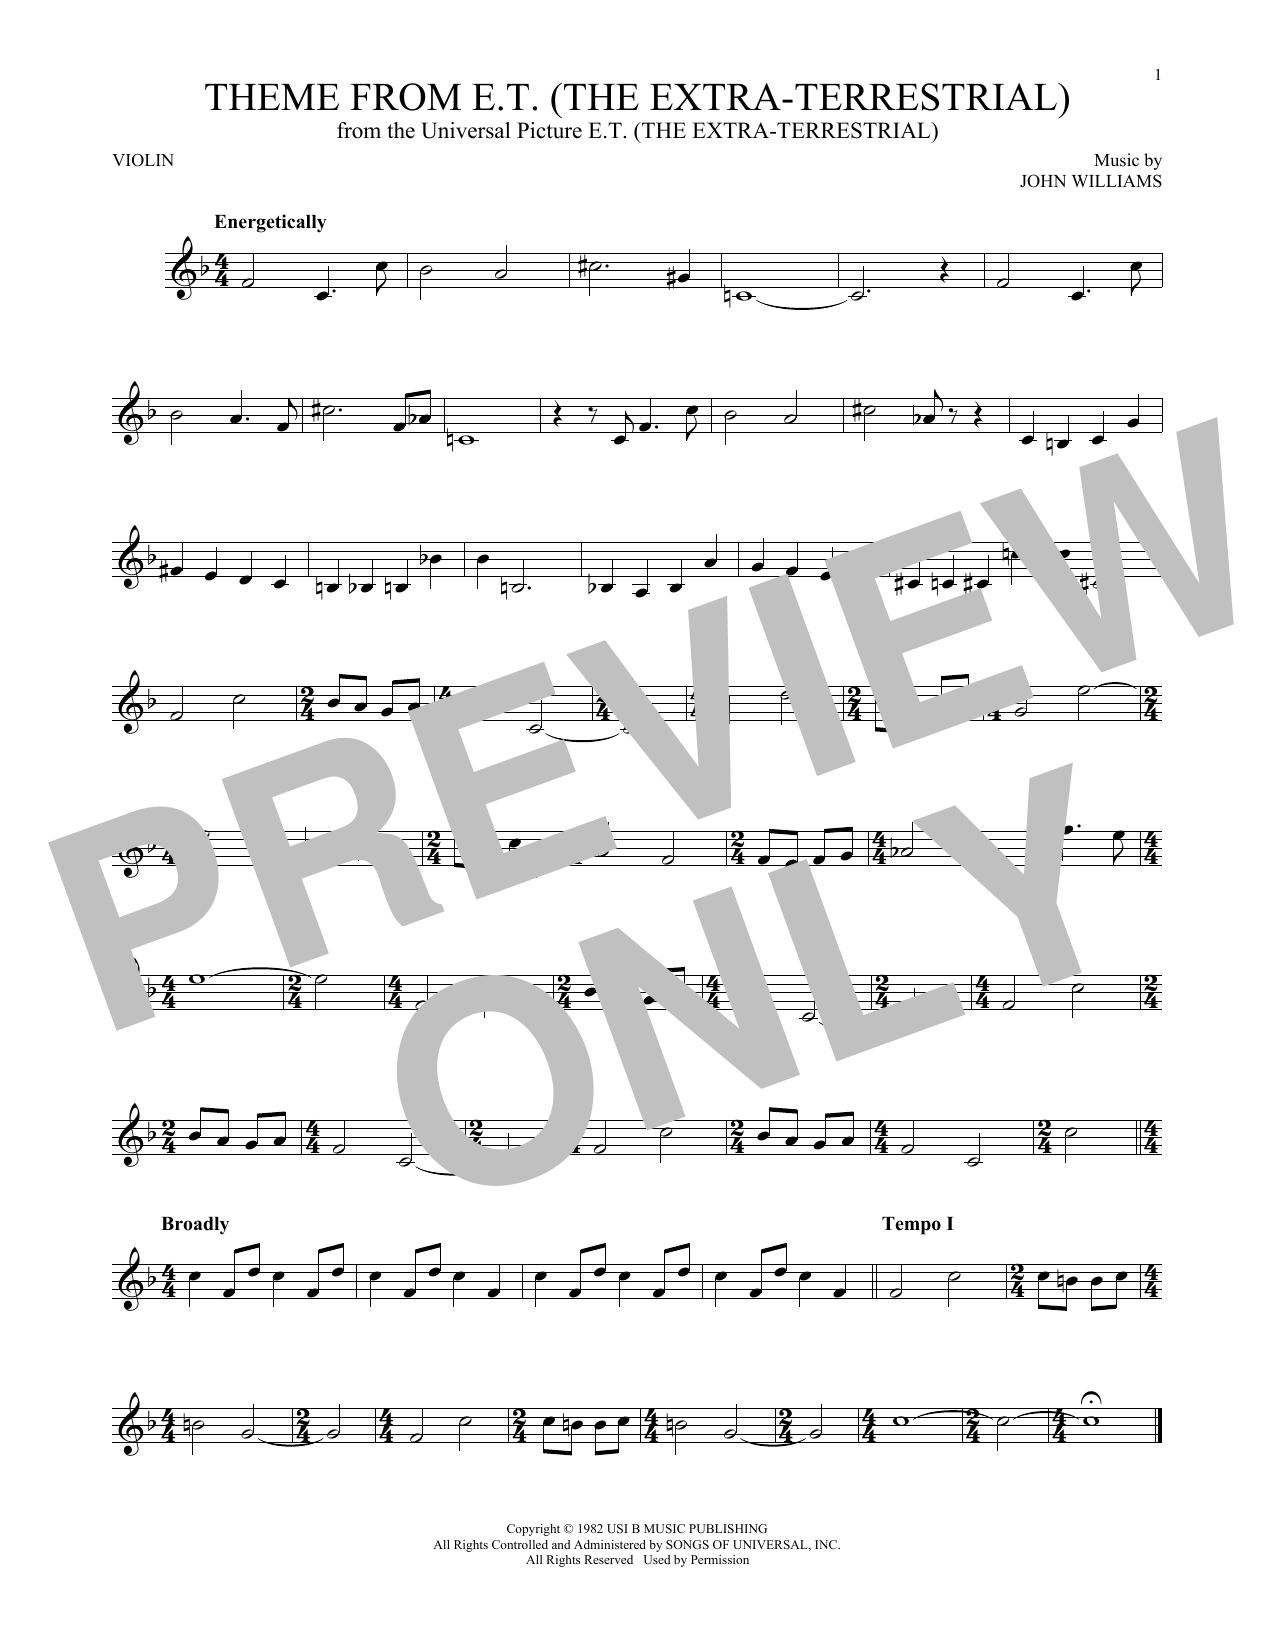 Theme From E.T. (The Extra-Terrestrial) (Violin Solo)